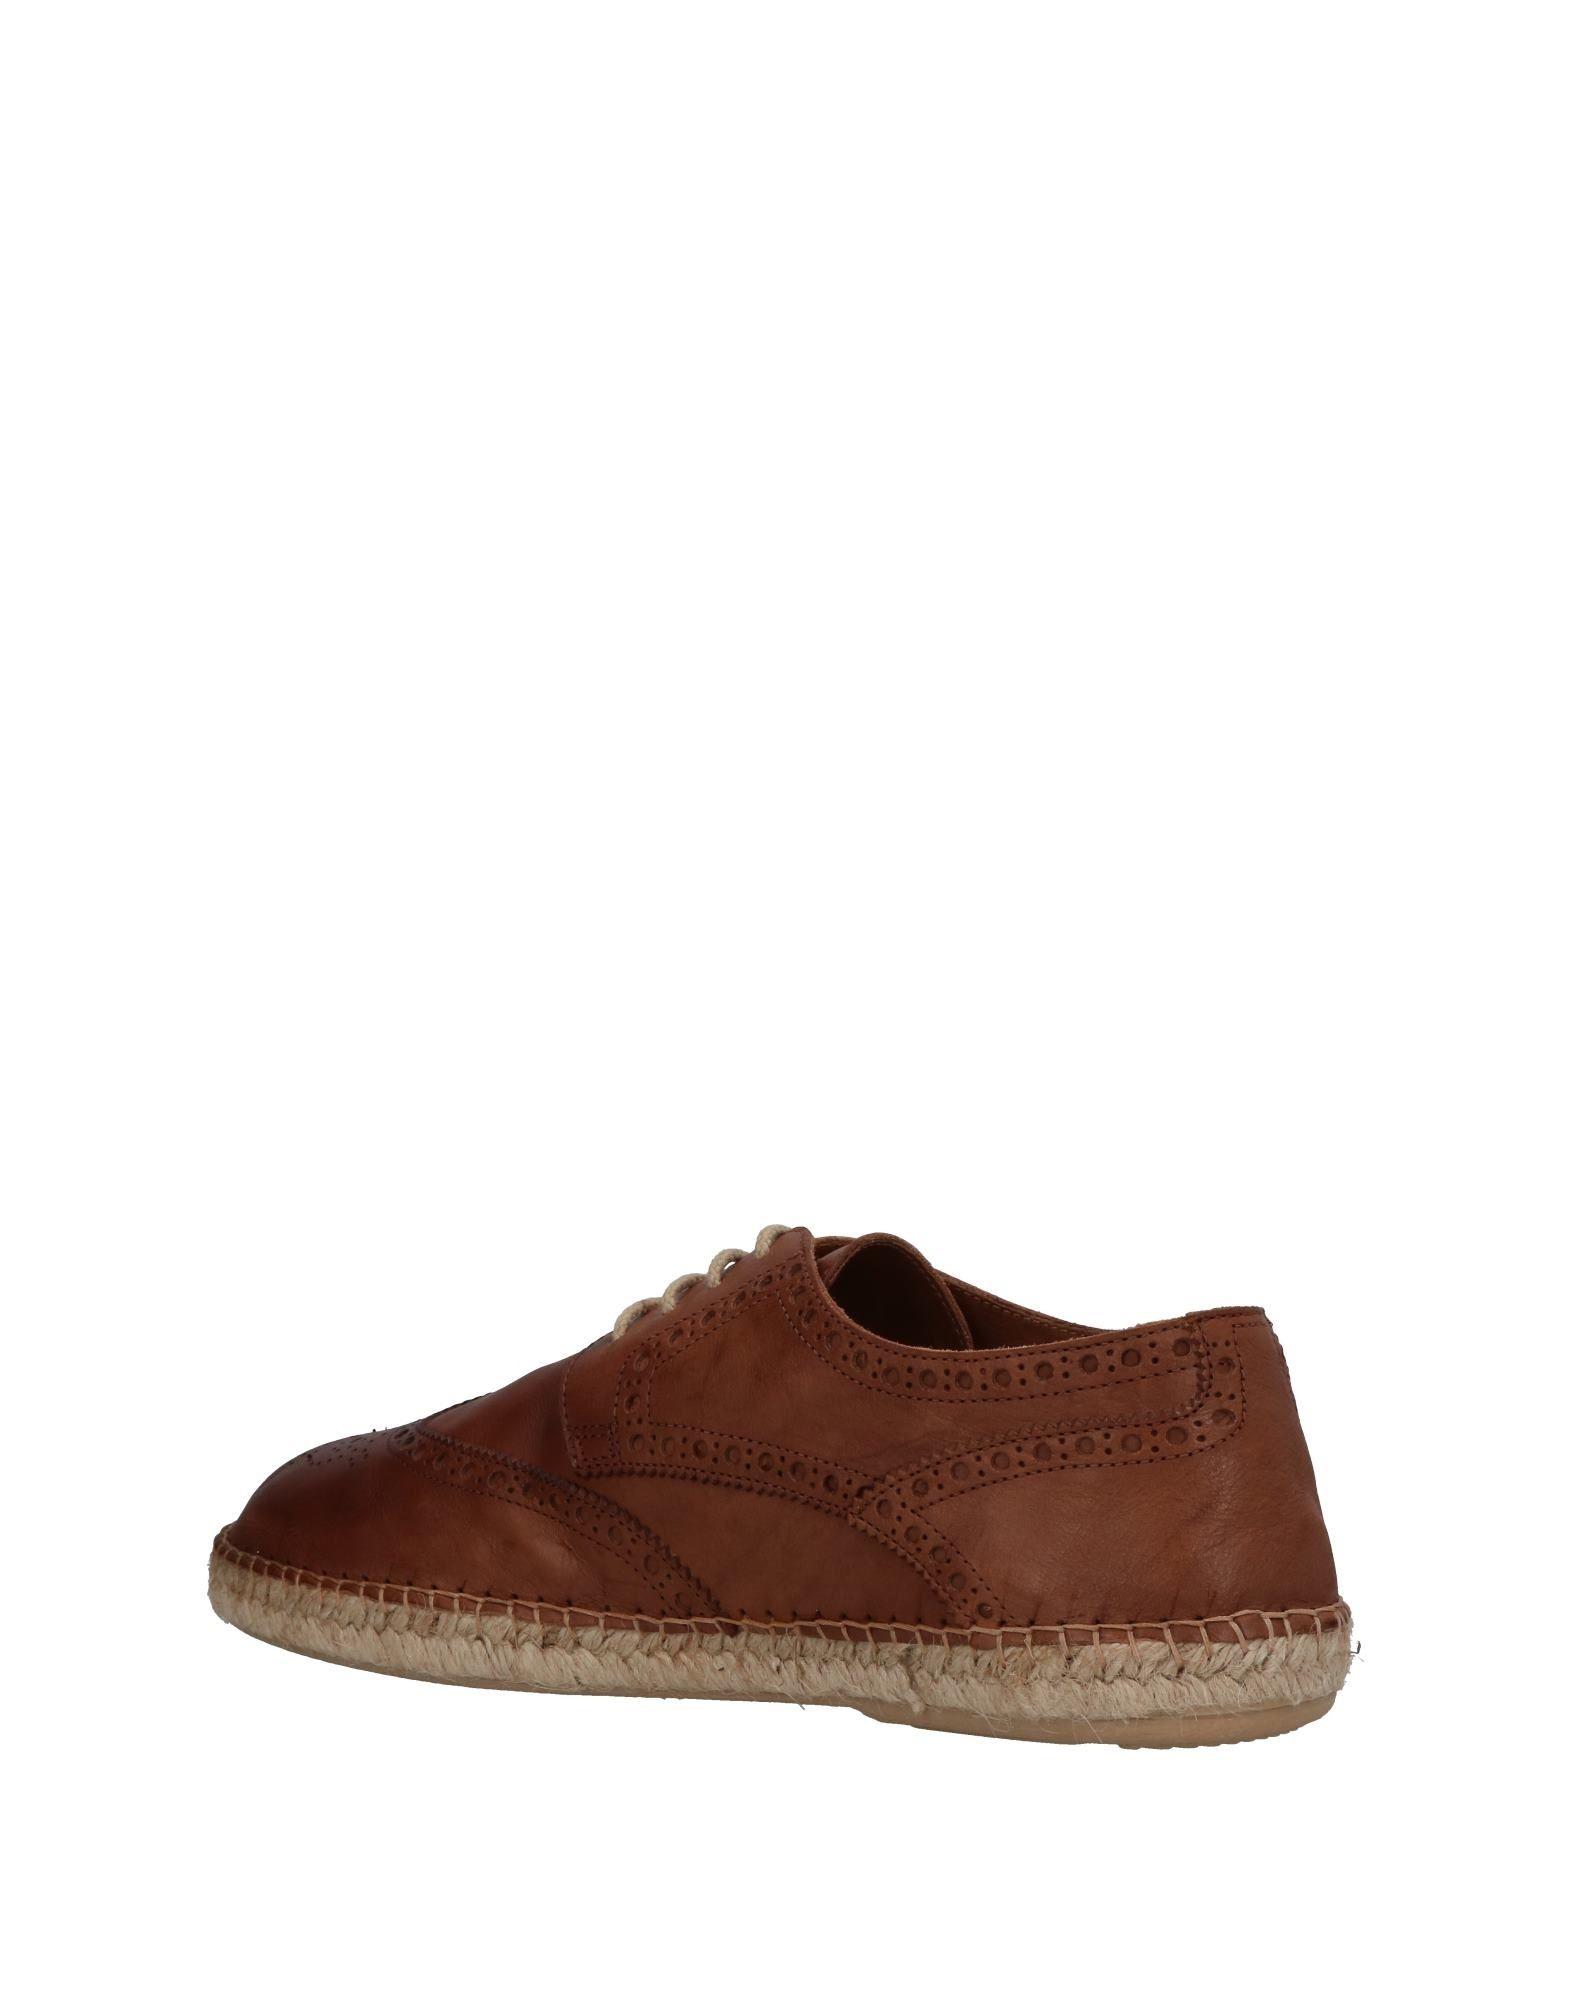 CHAUSSURES - Chaussures à lacetsLagoa V91qC